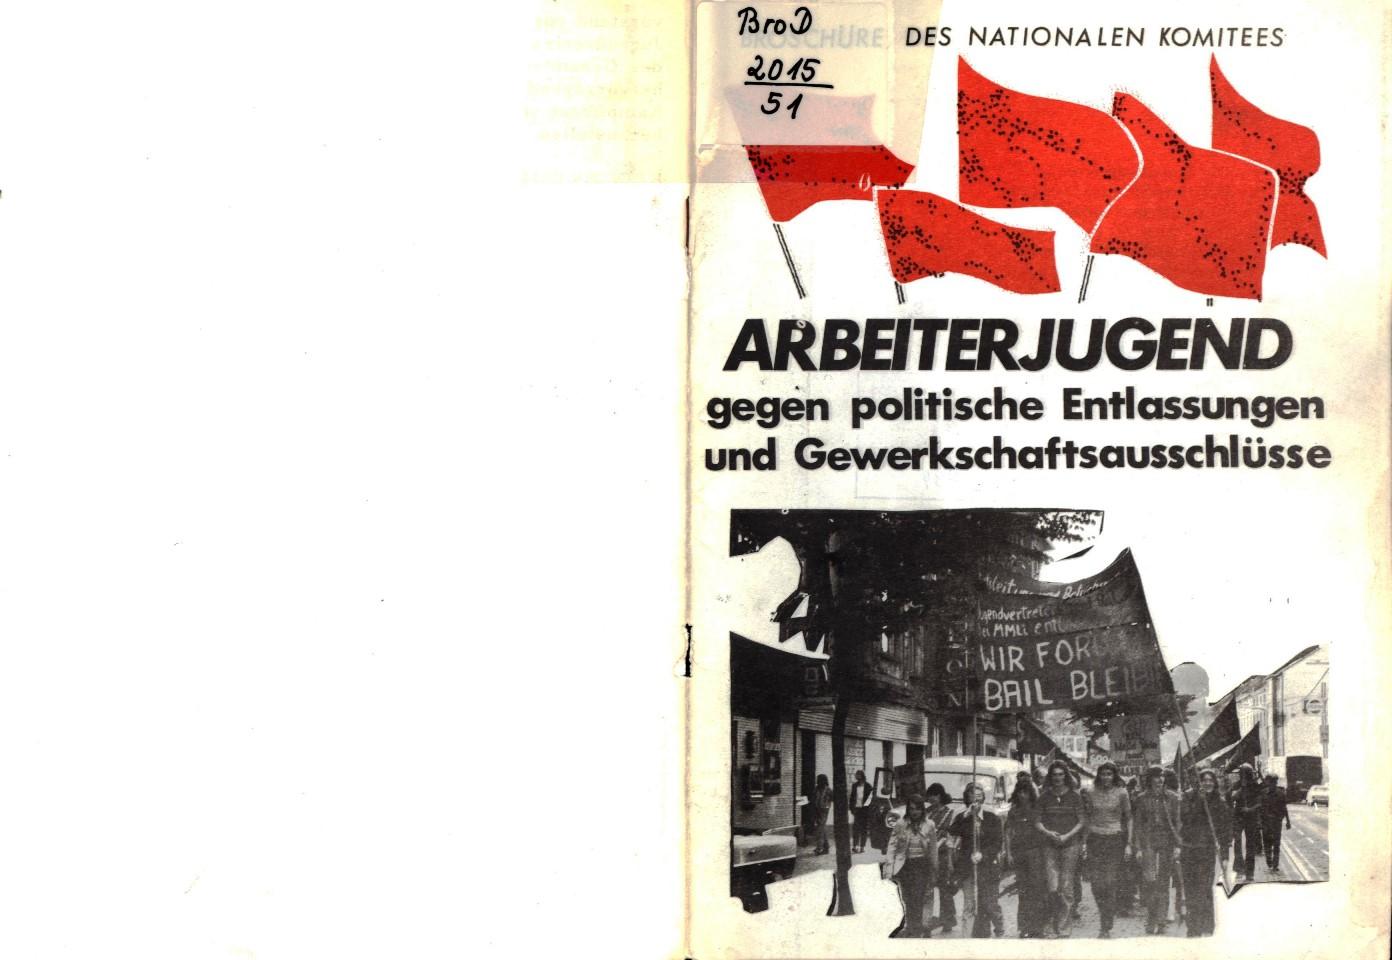 KJV_1973_NK_Arbeiterjugend_01